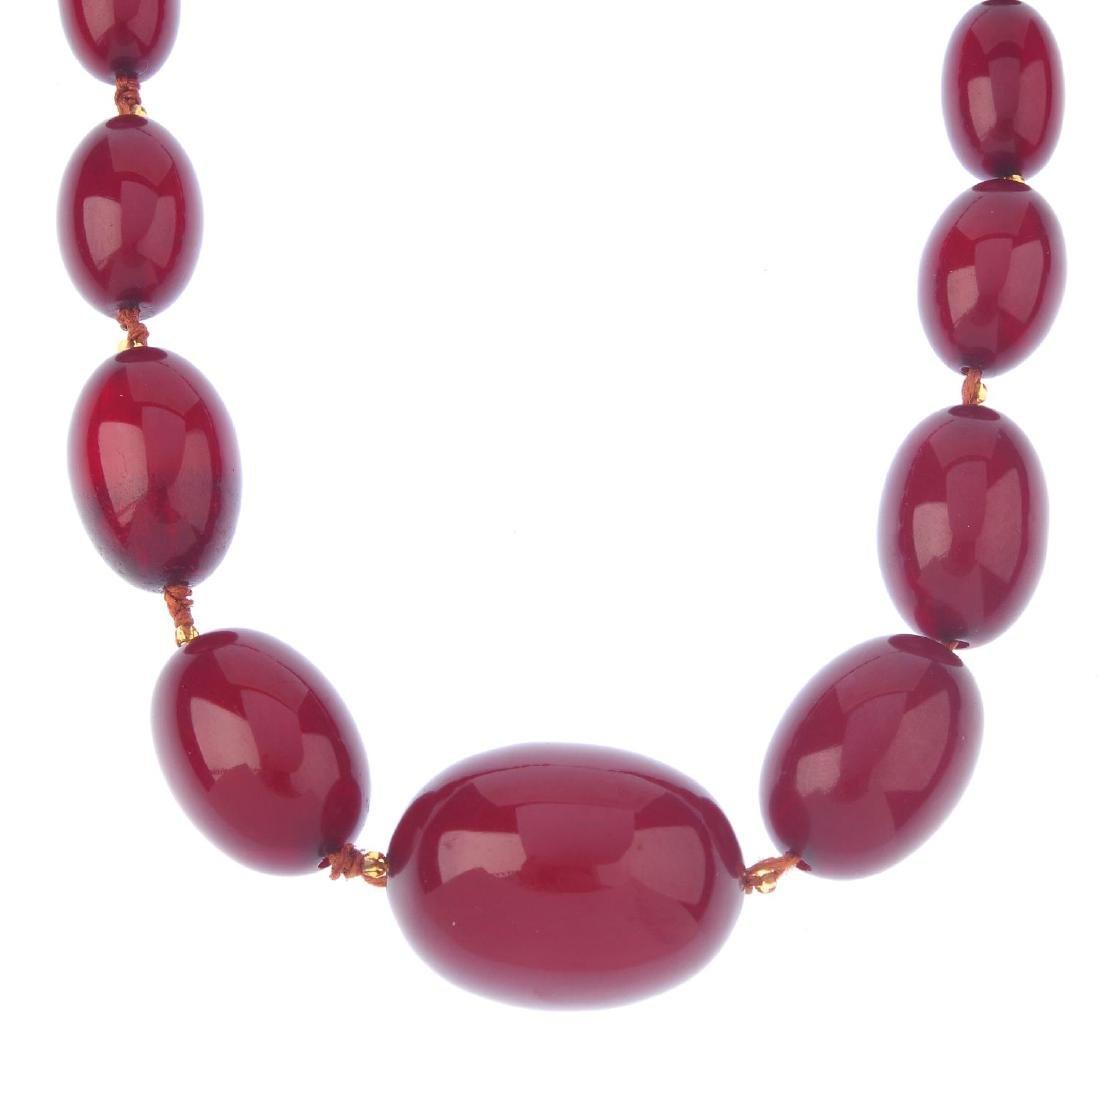 A bakelite bead necklace. Designed as twenty-seven